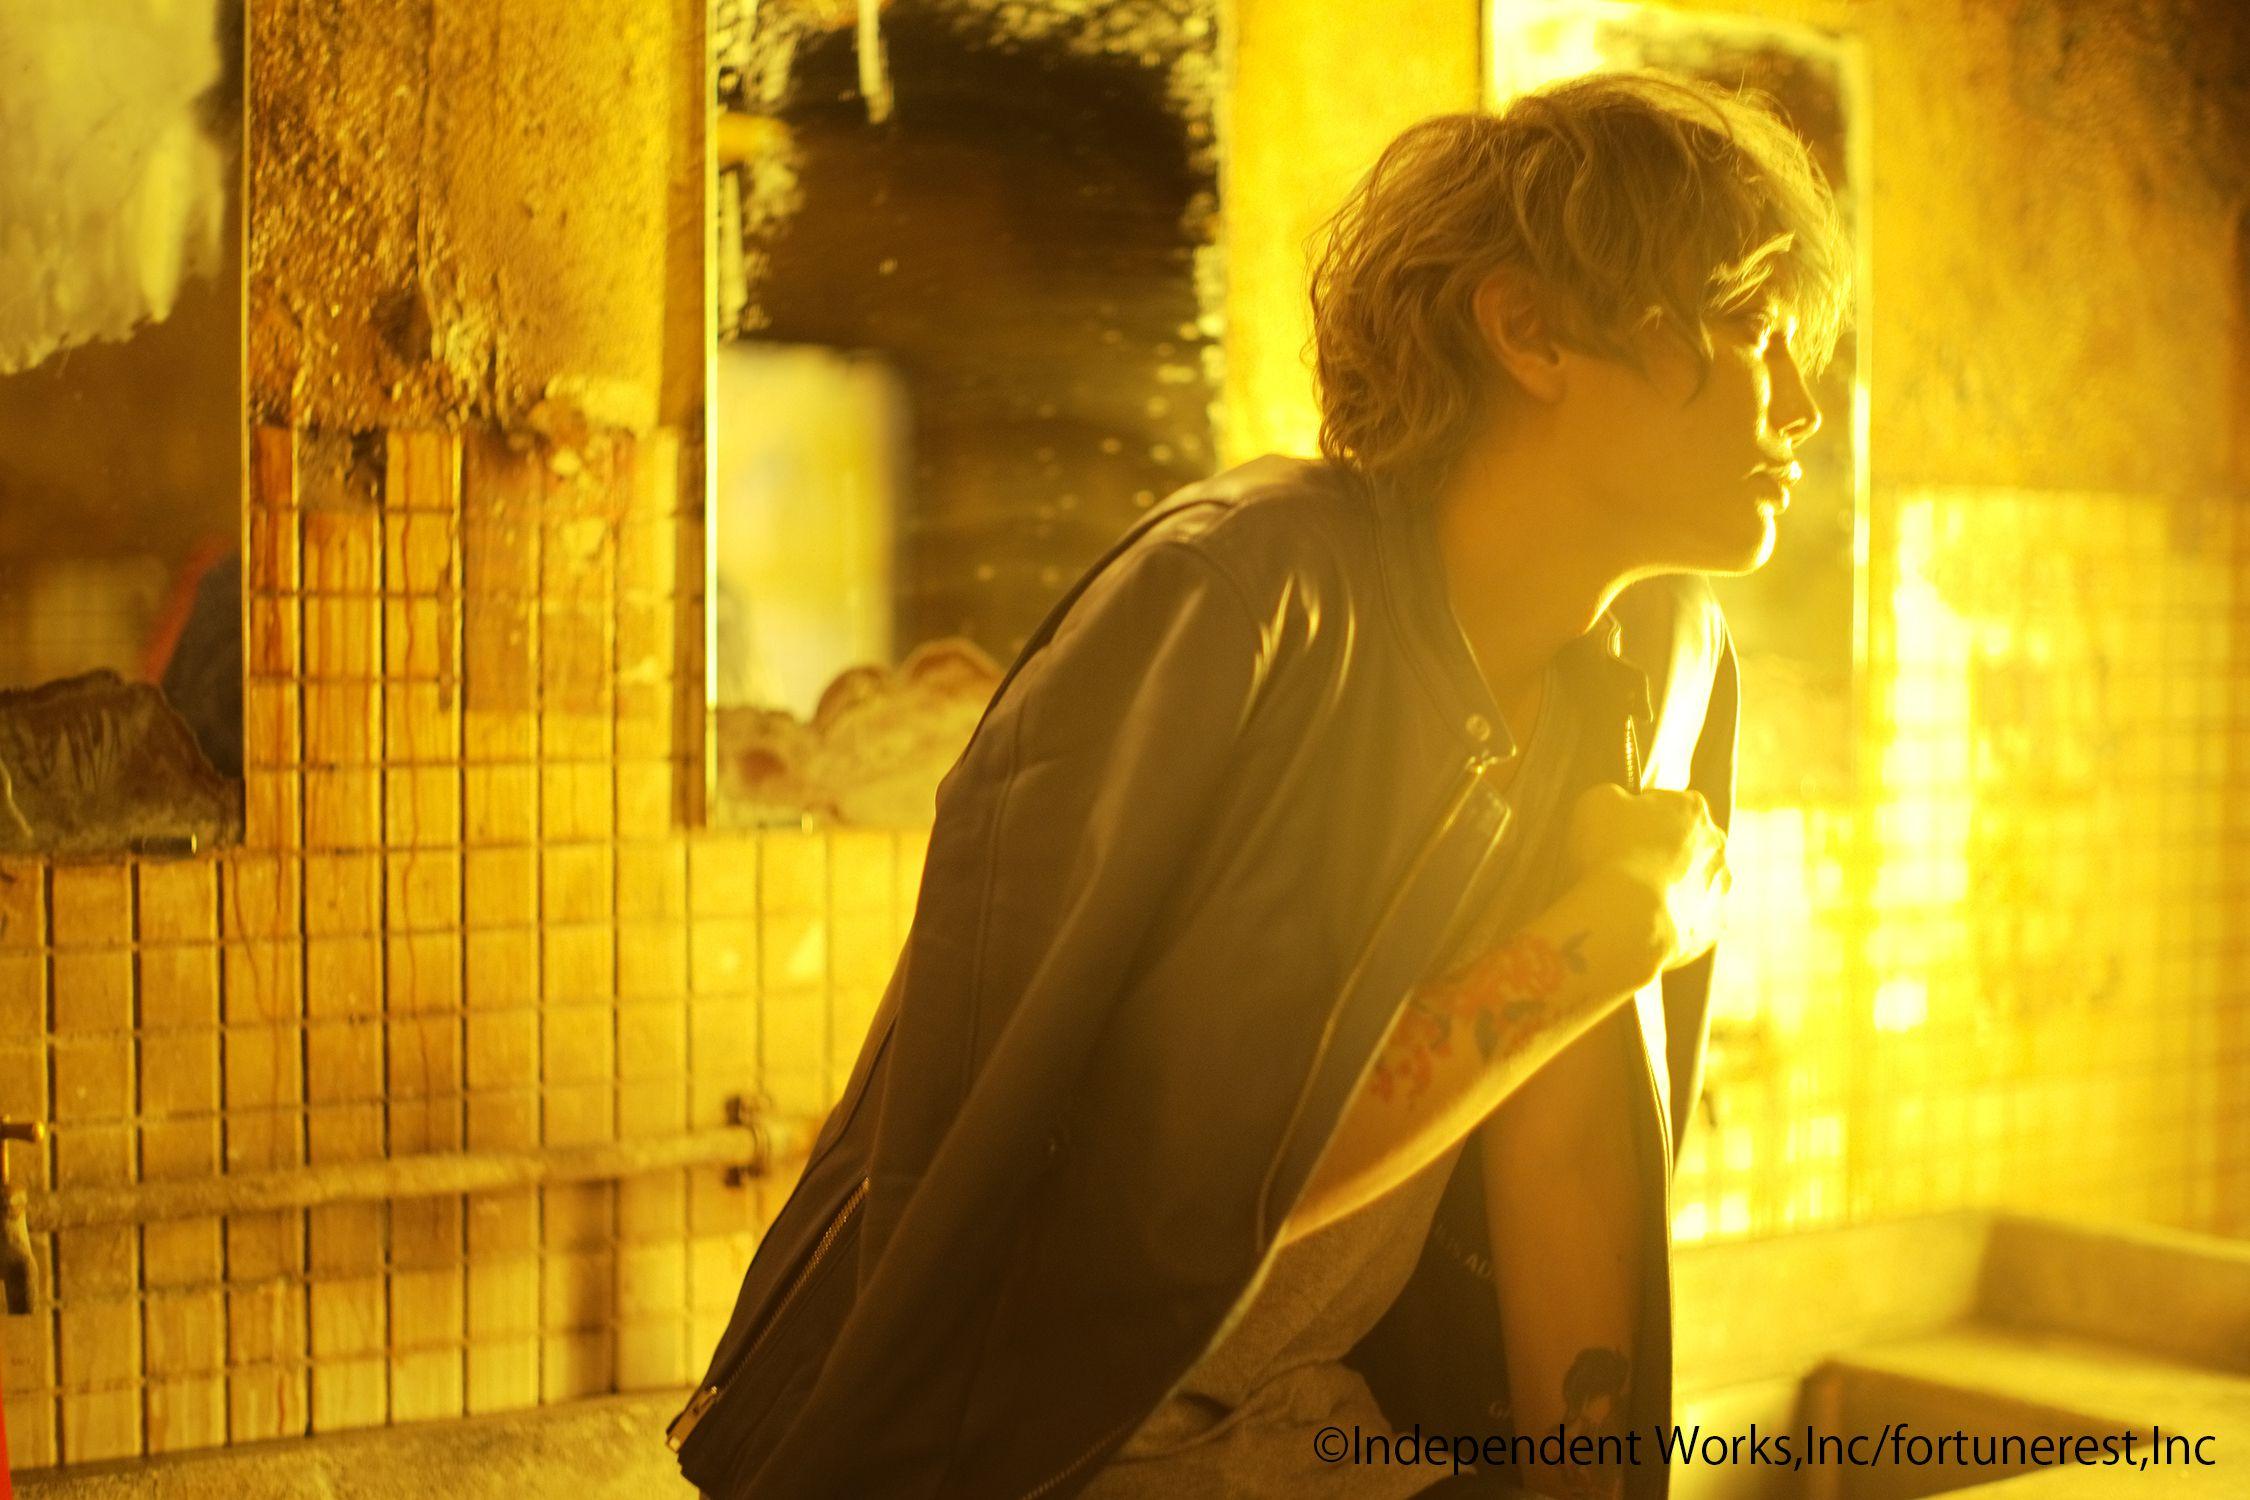 声優・浅沼晋太郎、異例発売前二度重版の1st写真集が発売の画像002